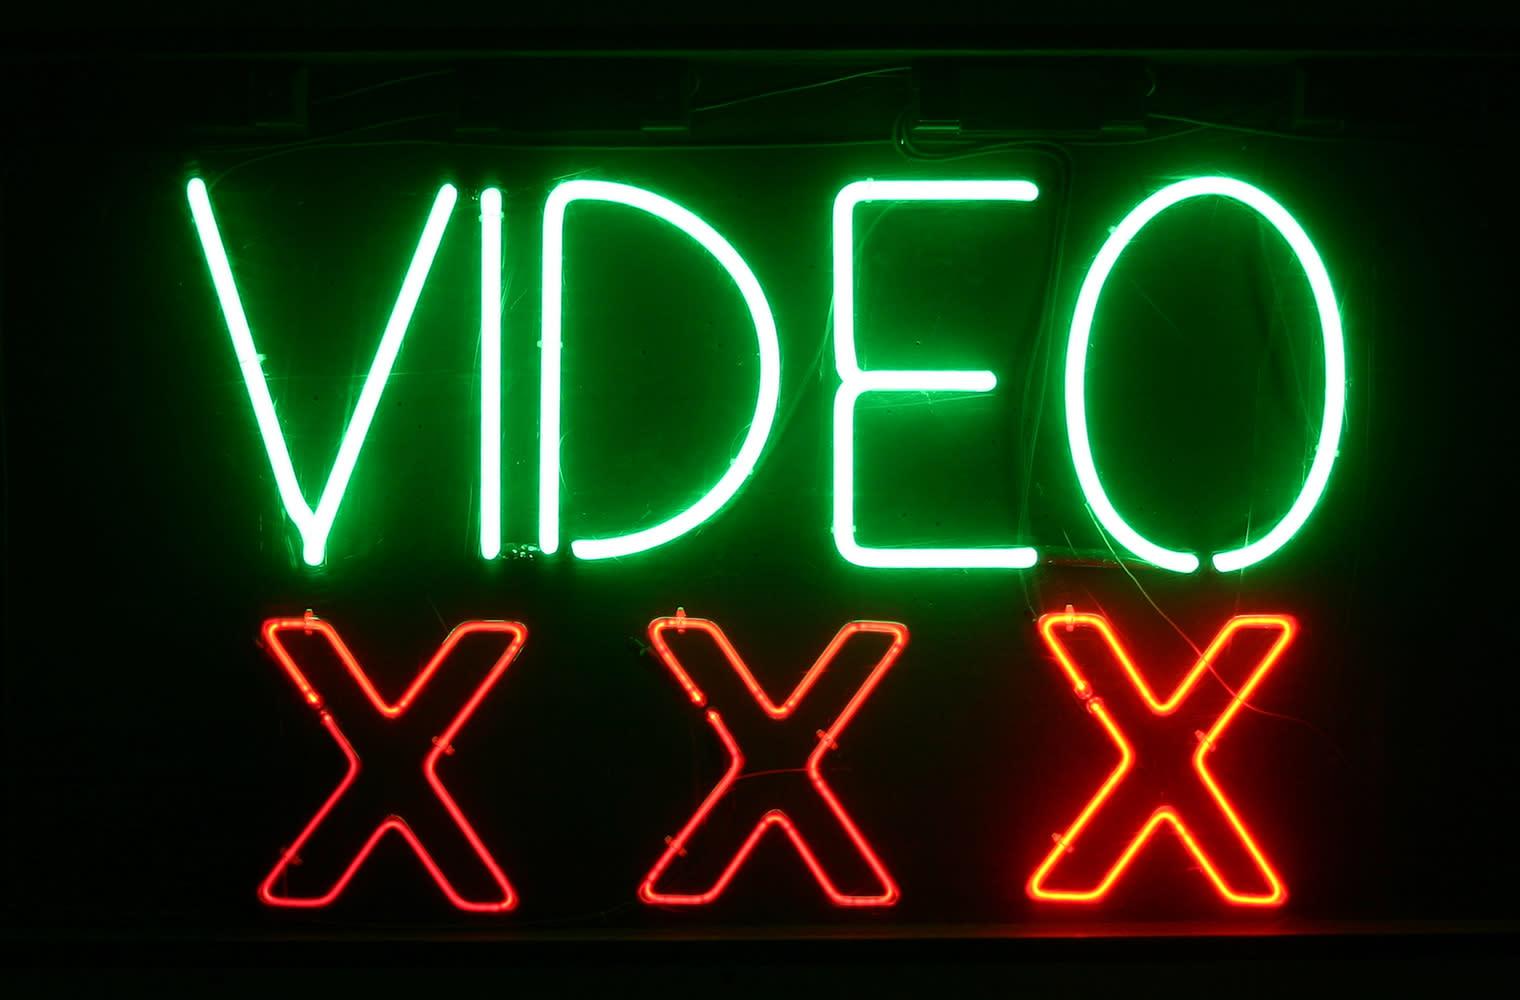 Videoonetube